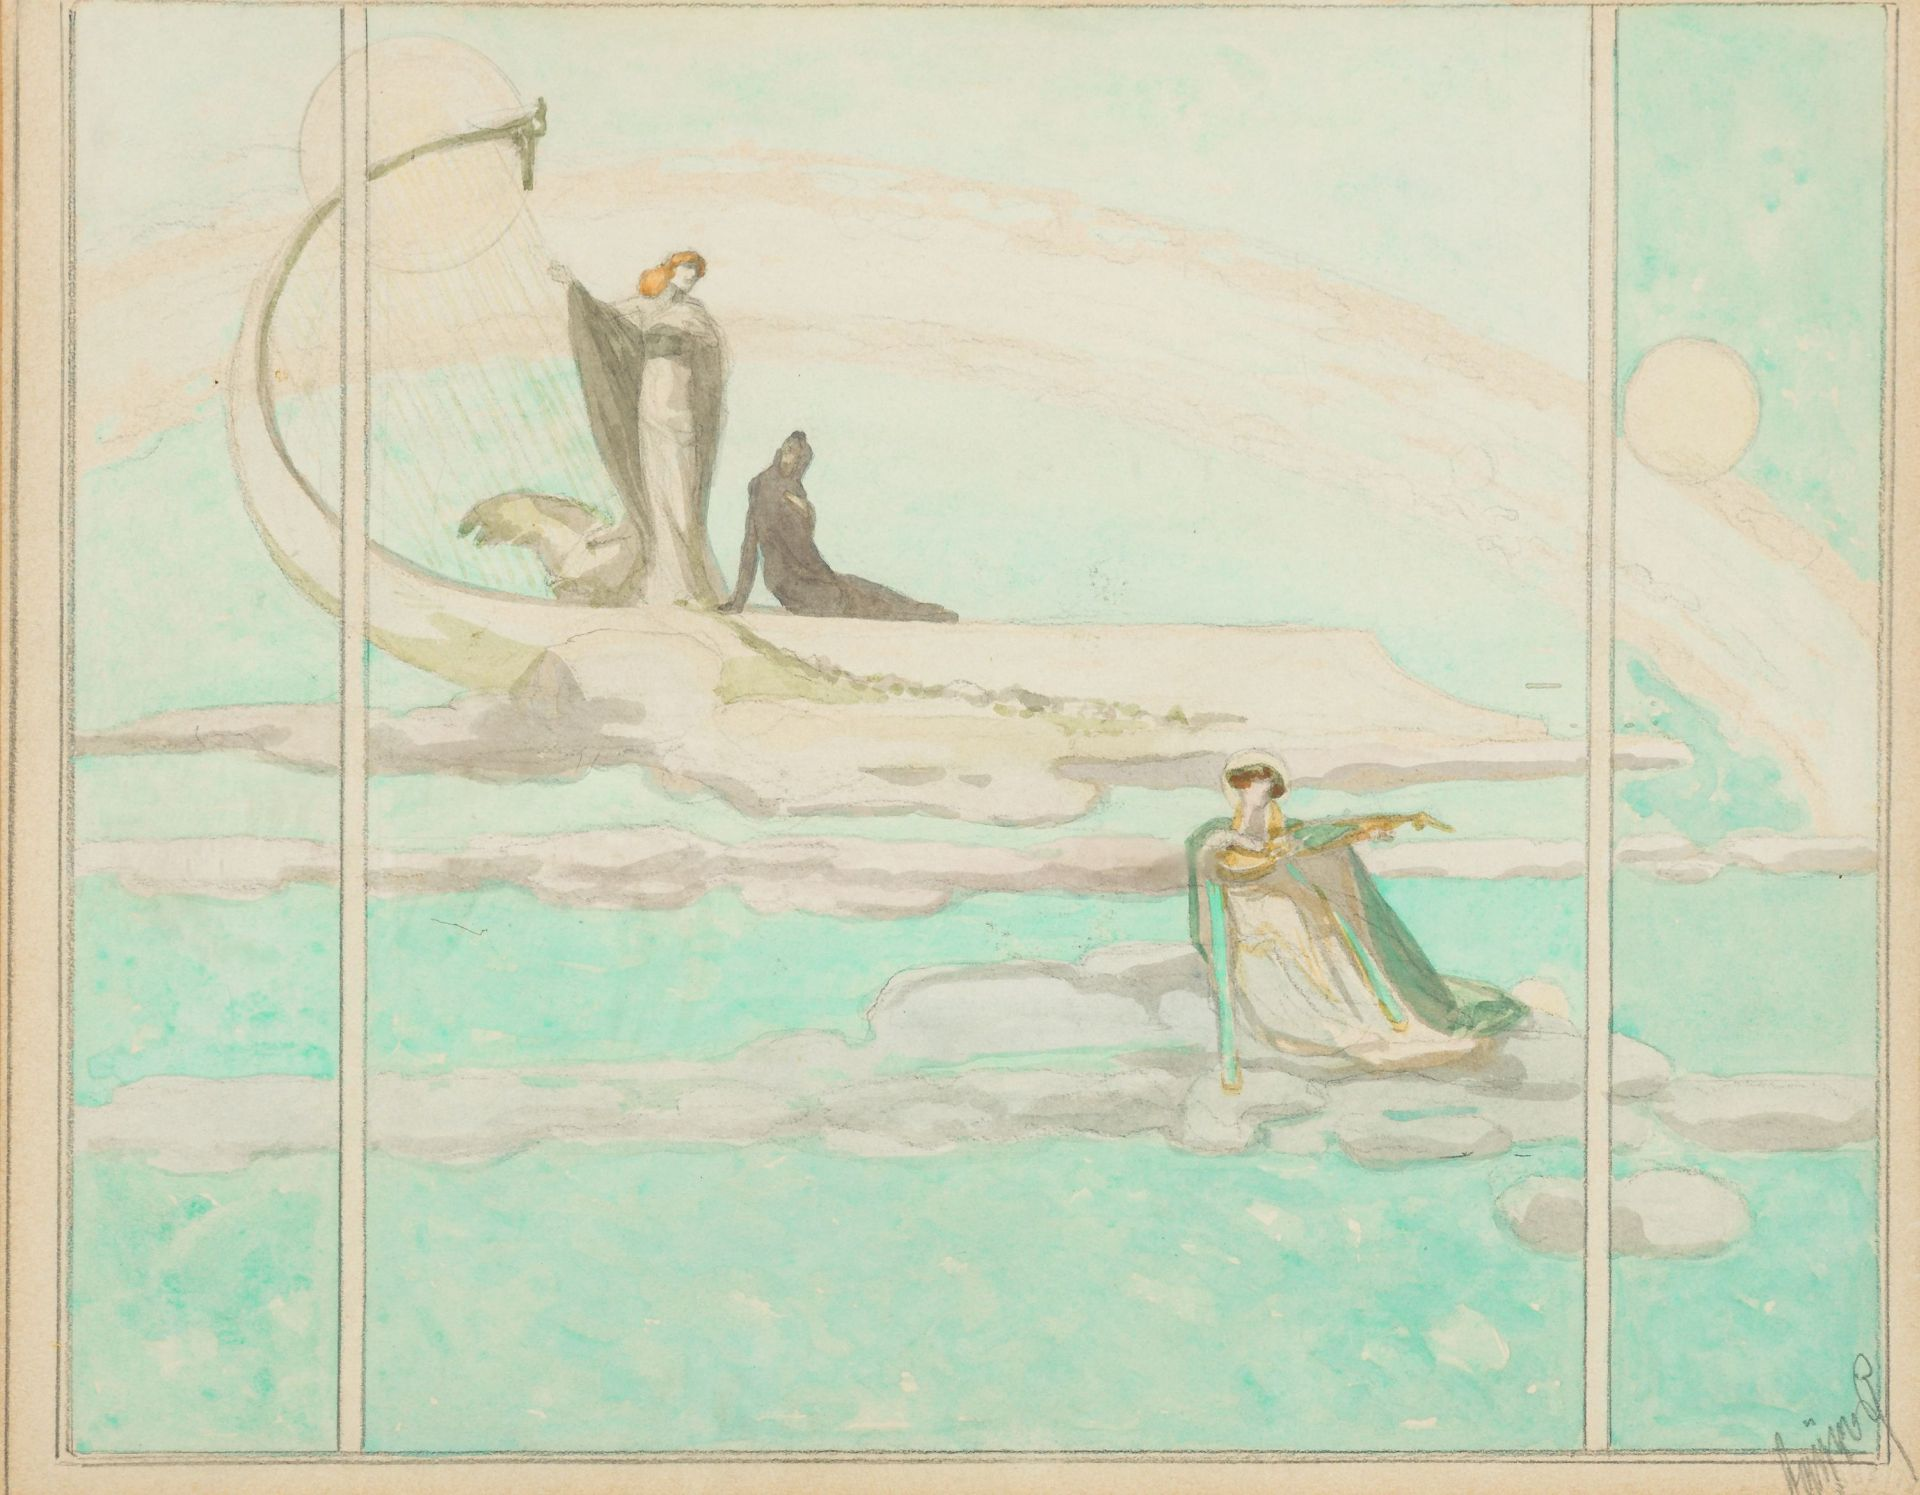 Franz von Bayros-Draft for an illustration for Dante's Divine Comedy: Paradise